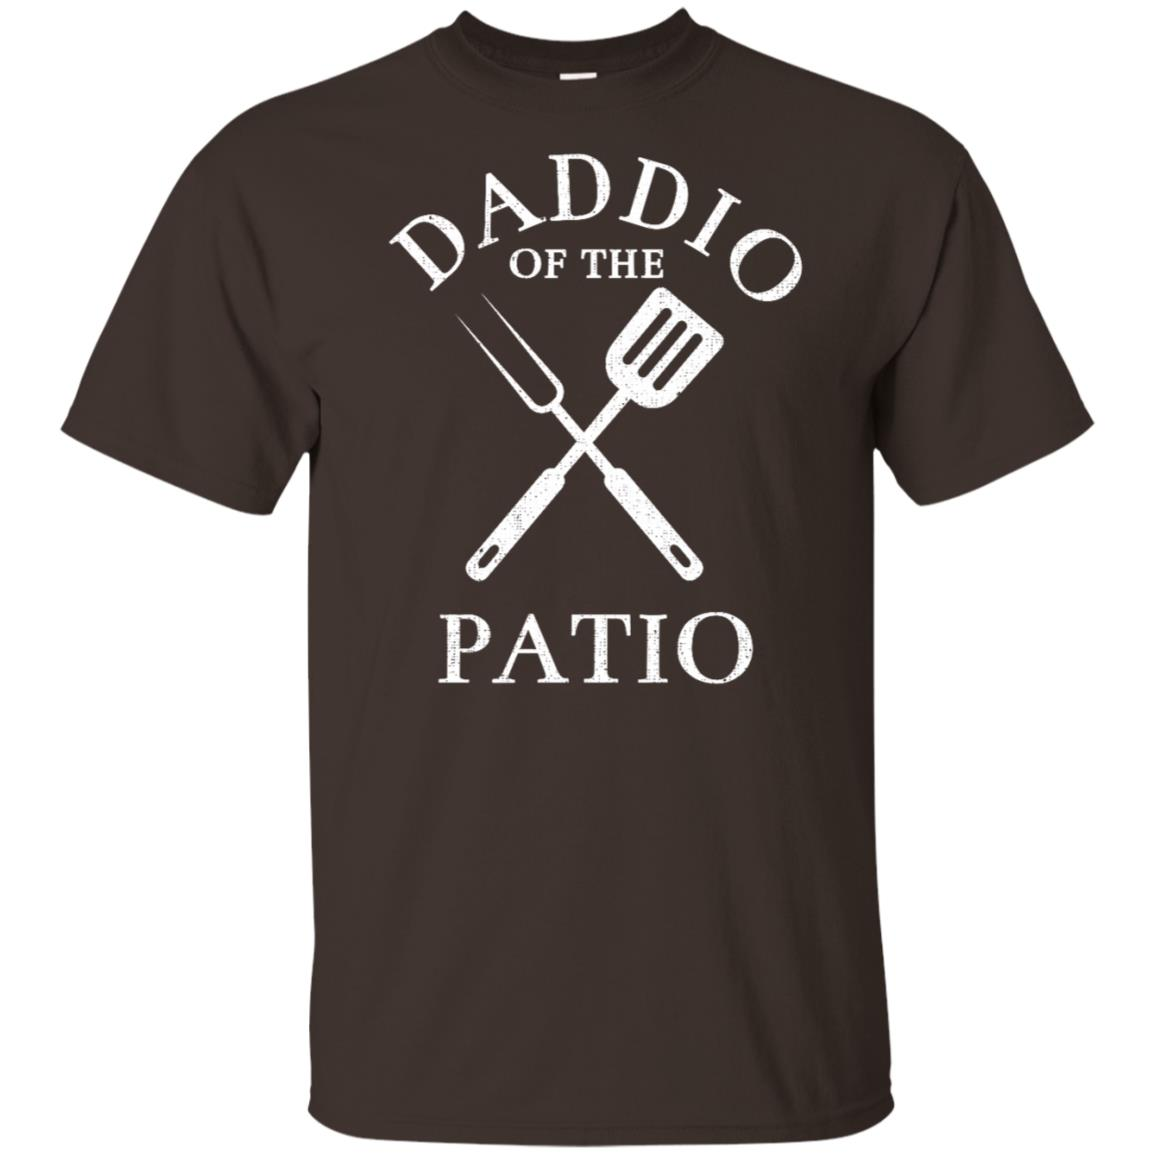 Daddio of the Patio Spatula Tee Unisex Short Sleeve